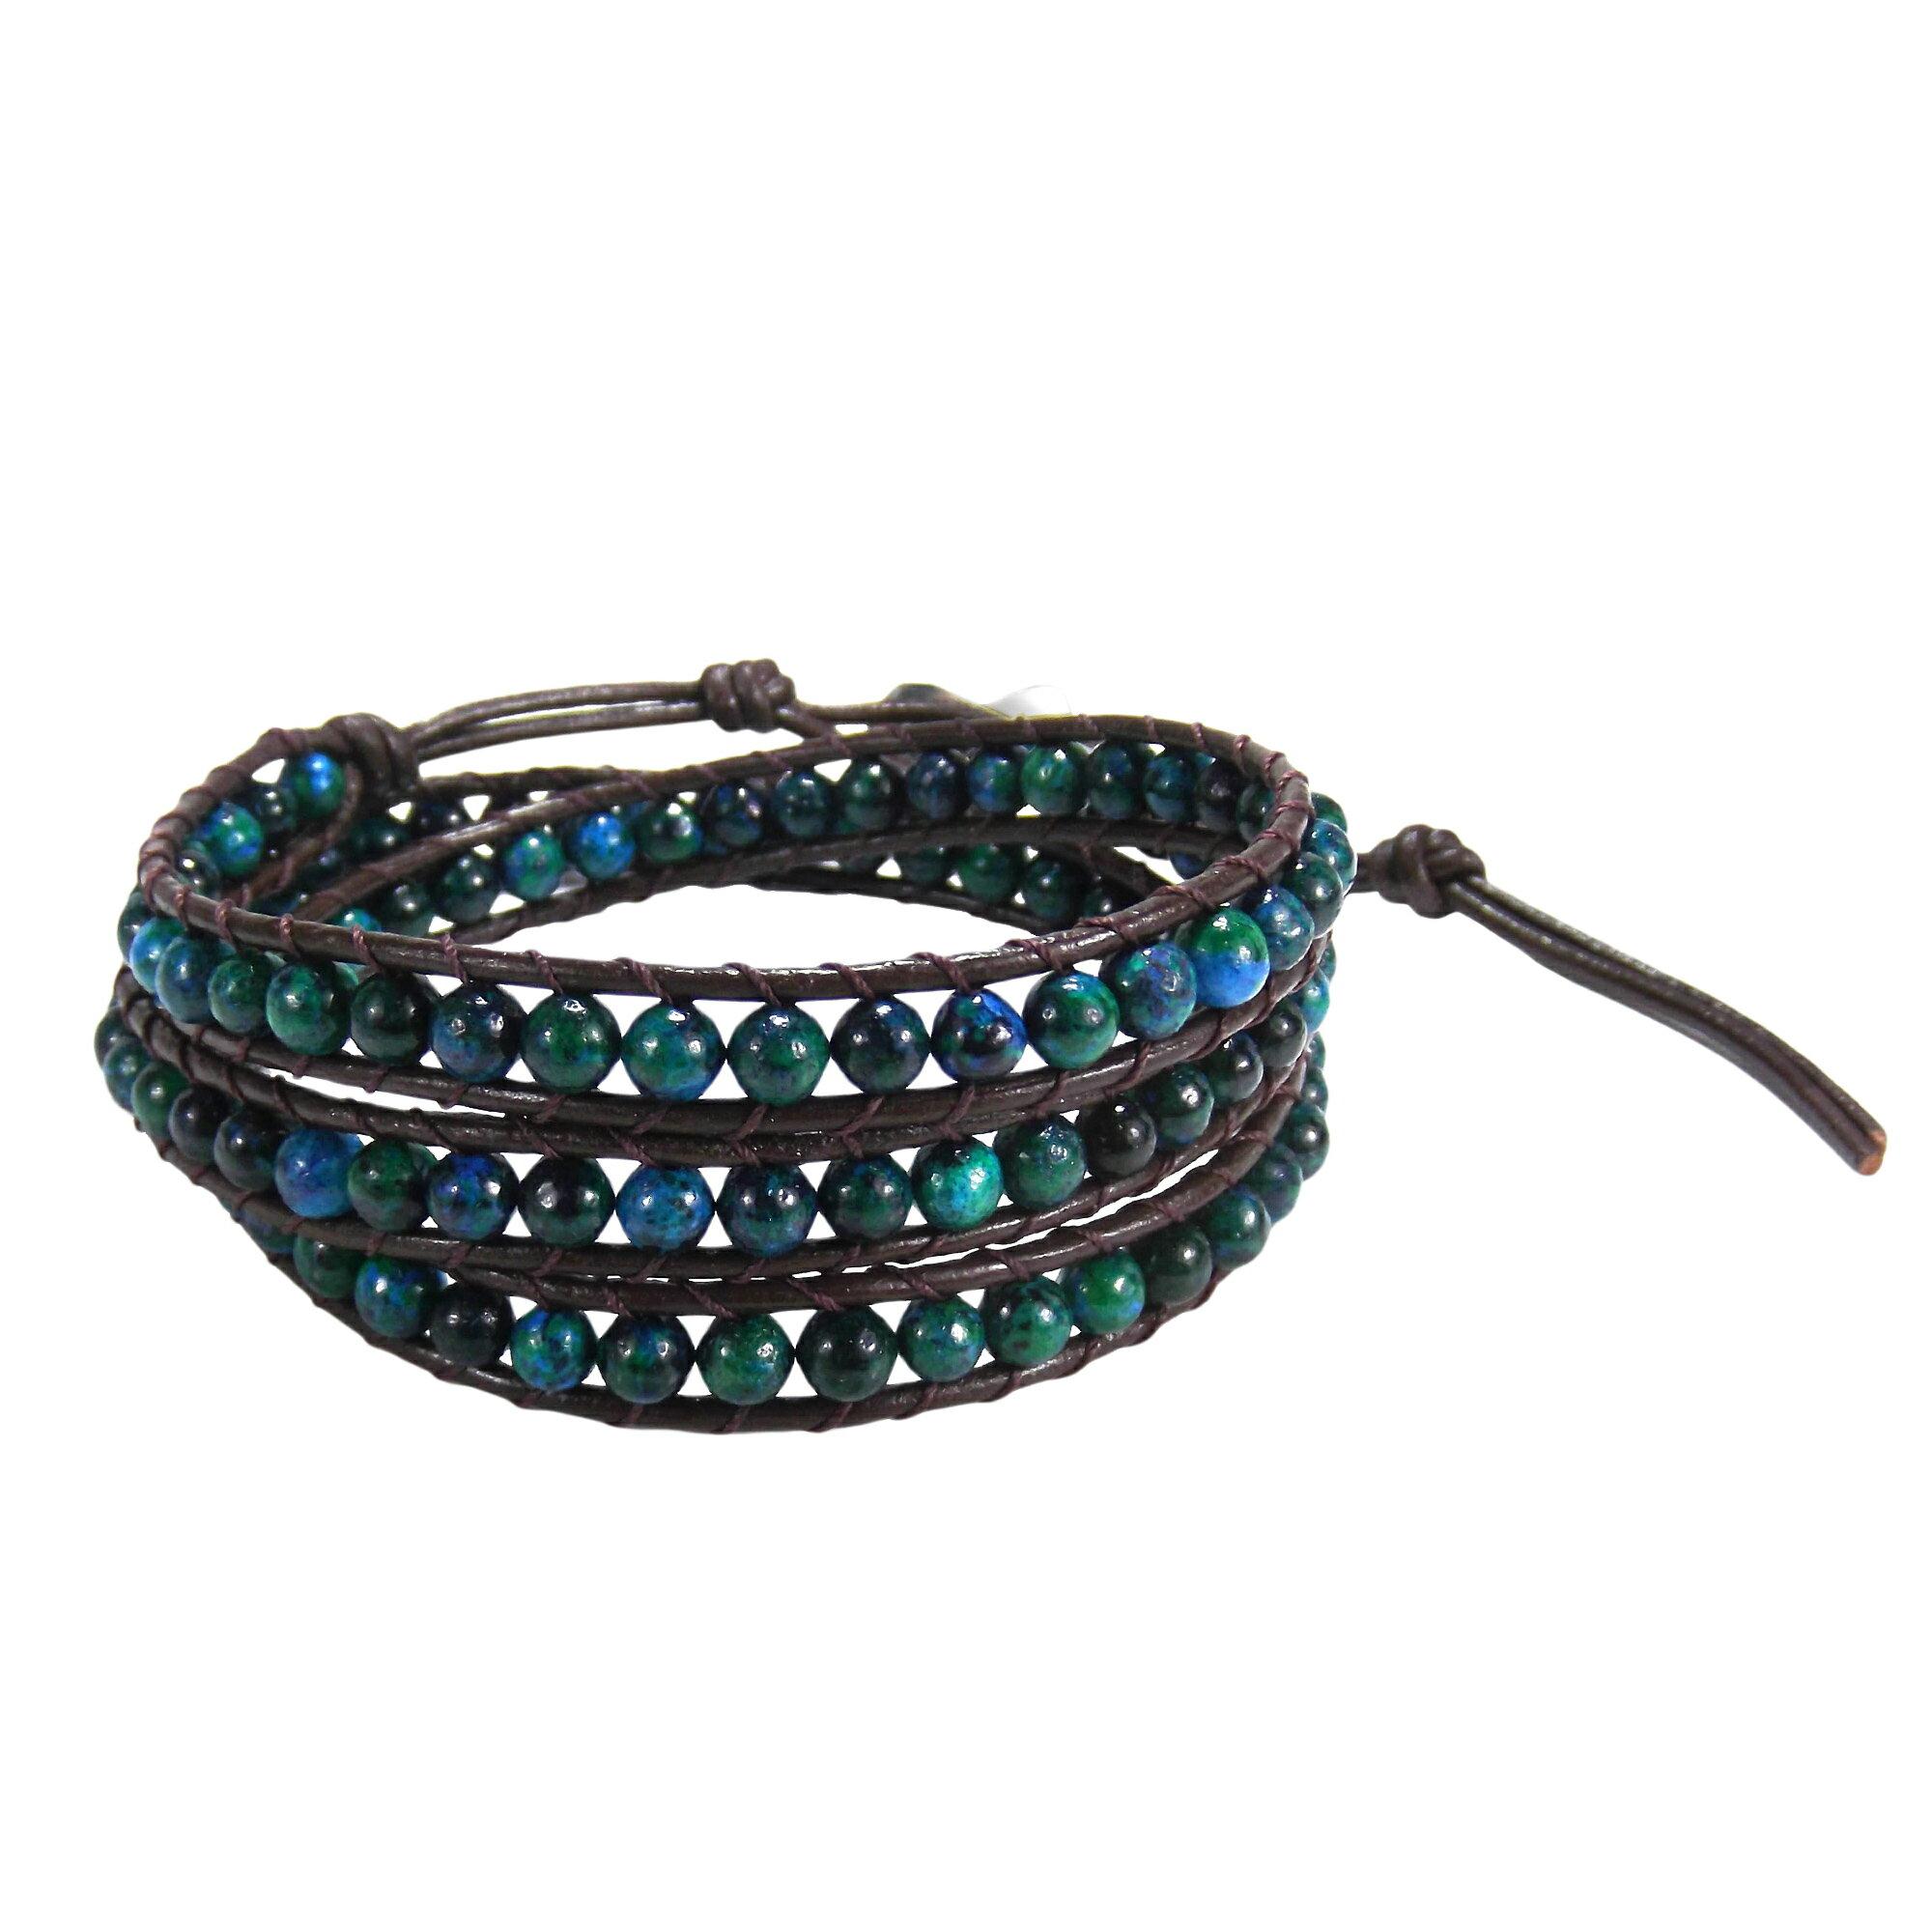 Blue-Green Muse Malachite Gemstone Tribal Wrap Leather Bracelet (Thailand) 0